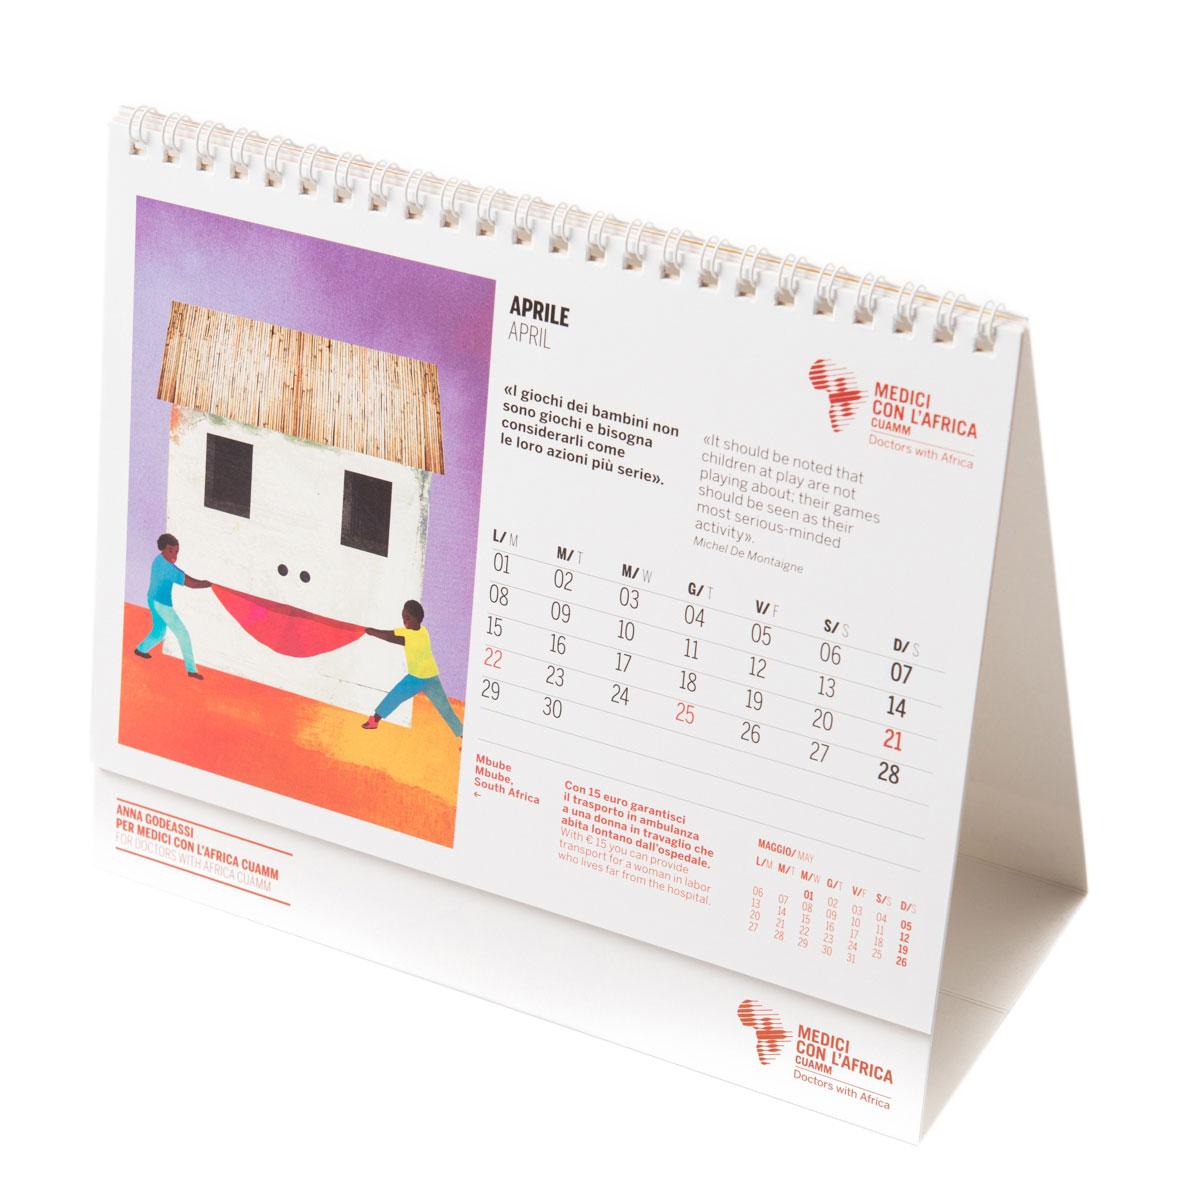 Calendario D.Special Edition Anna Godeassi